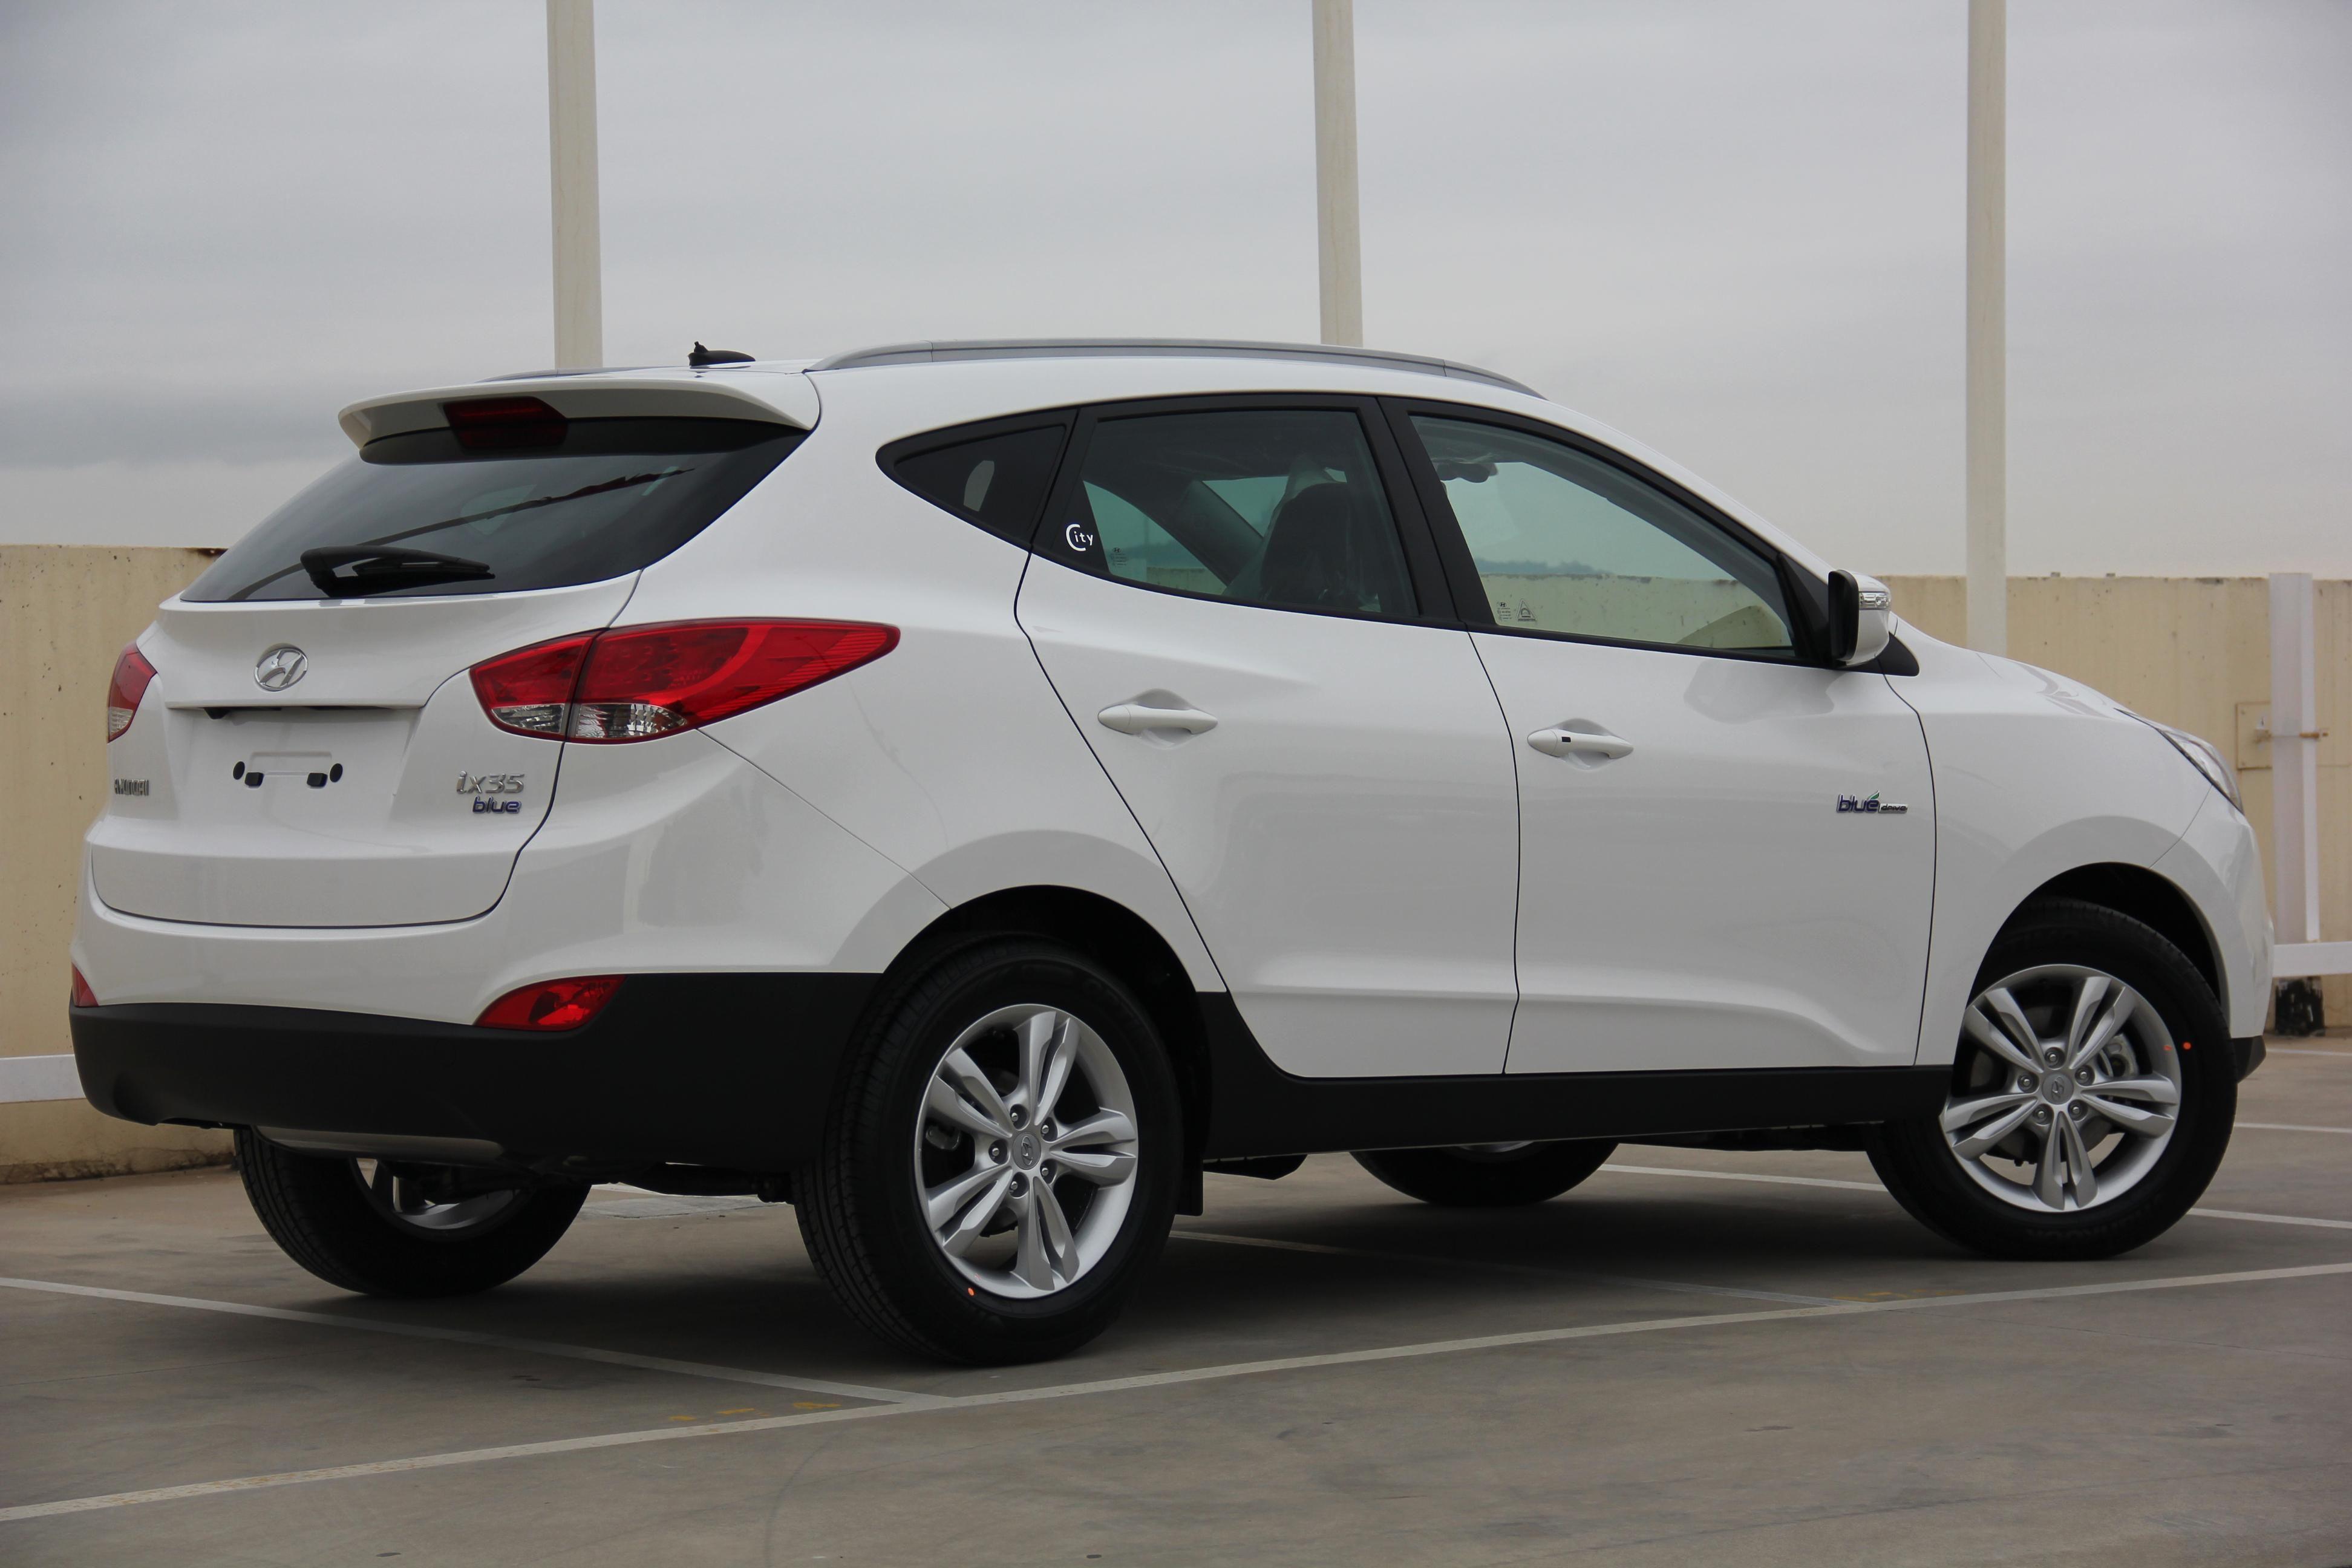 Pin Em Hyundai Ix35 Km0 En Oferta Blanco